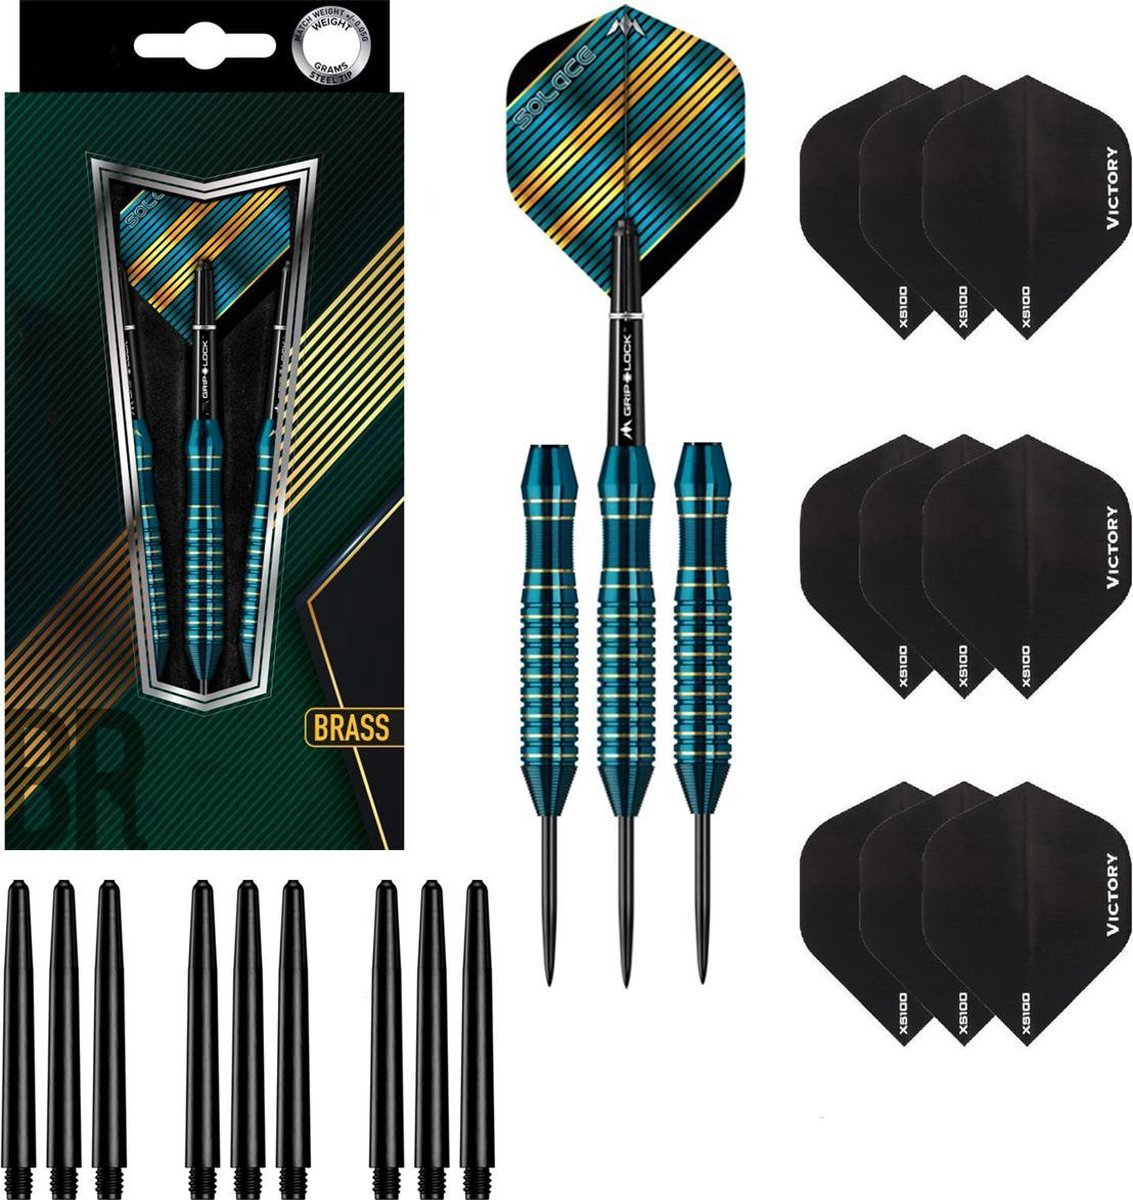 Dragon Darts Aqua Hawk - dartpijlen - dart shafts - dart flights - dartpijlen 24 gram - 100% brass